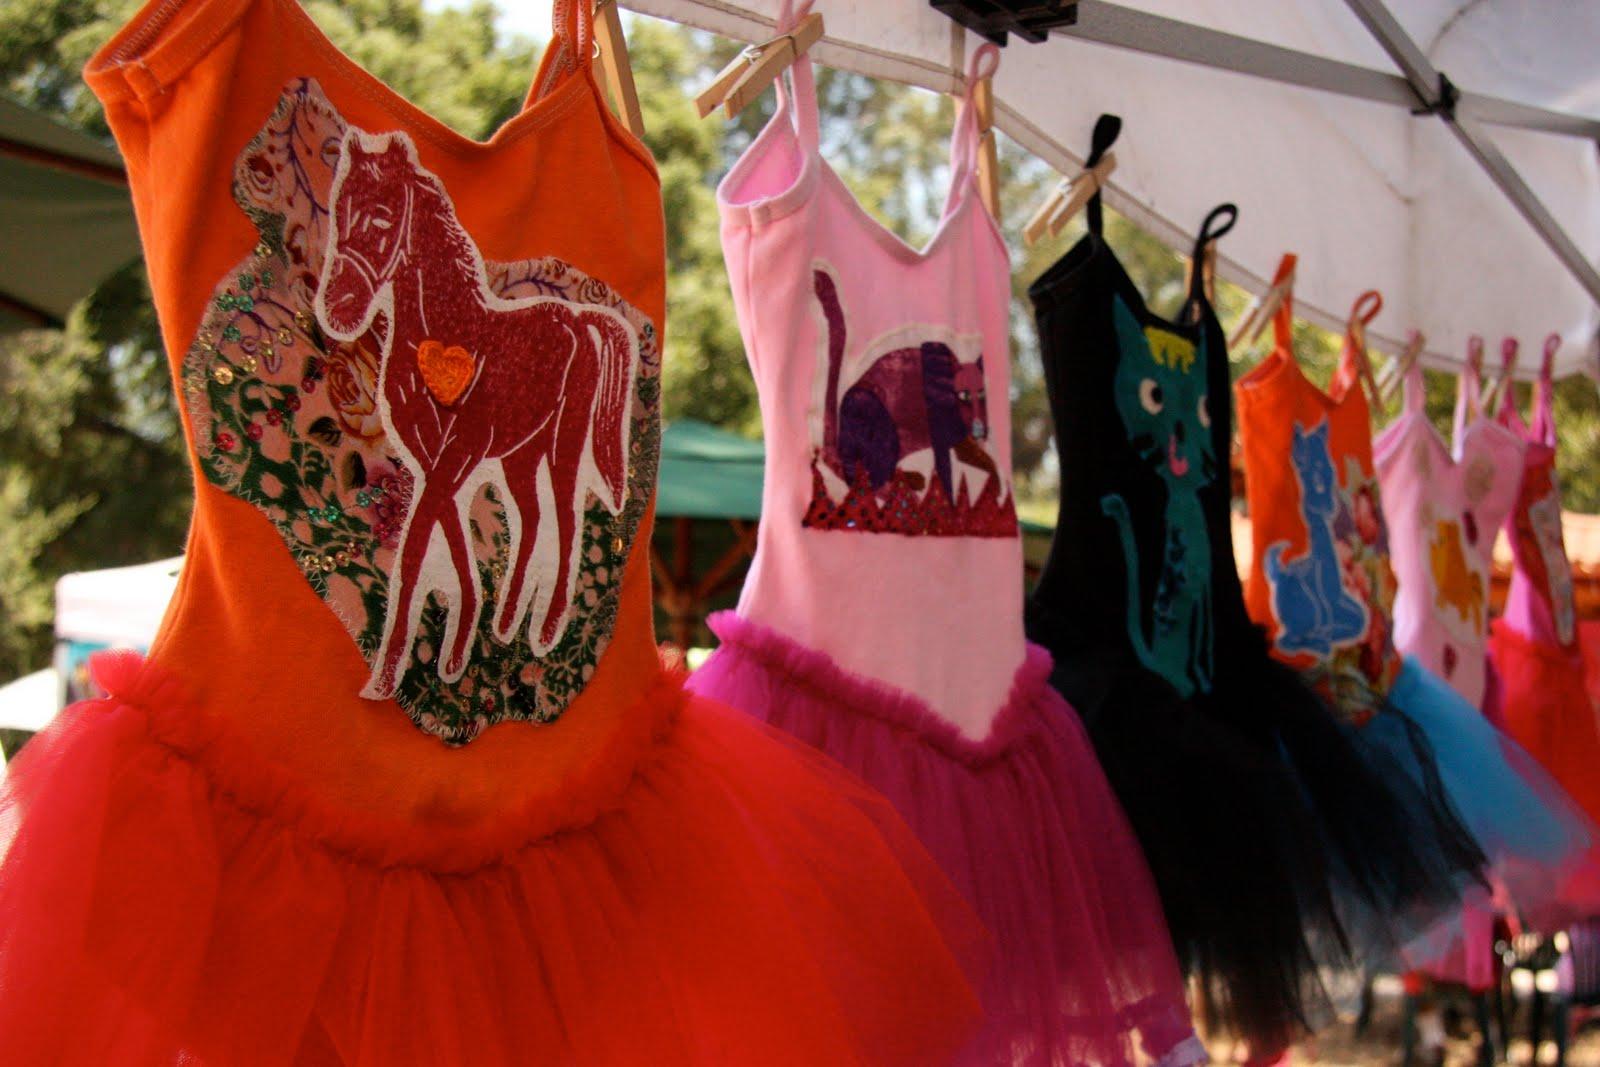 Hosting the Ojai Valley Lavender Festival 6/26/10, cute dress